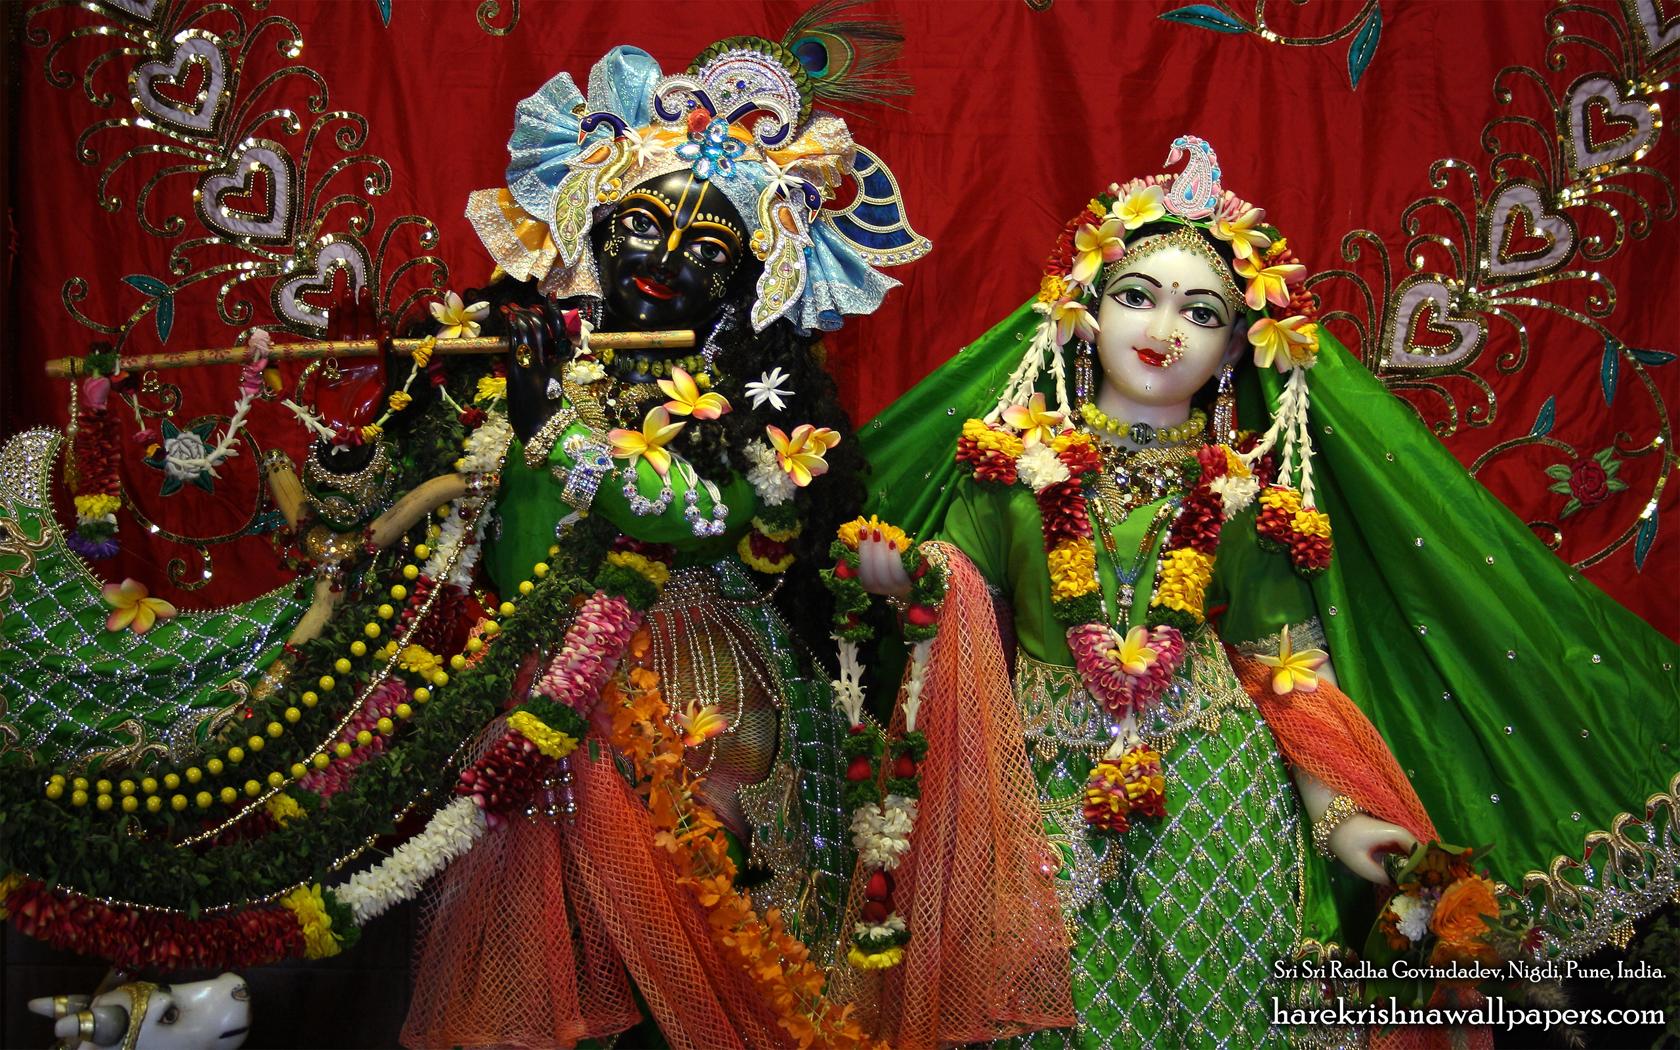 Sri Sri Radha Govind Close up Wallpaper (011) Size 1680x1050 Download